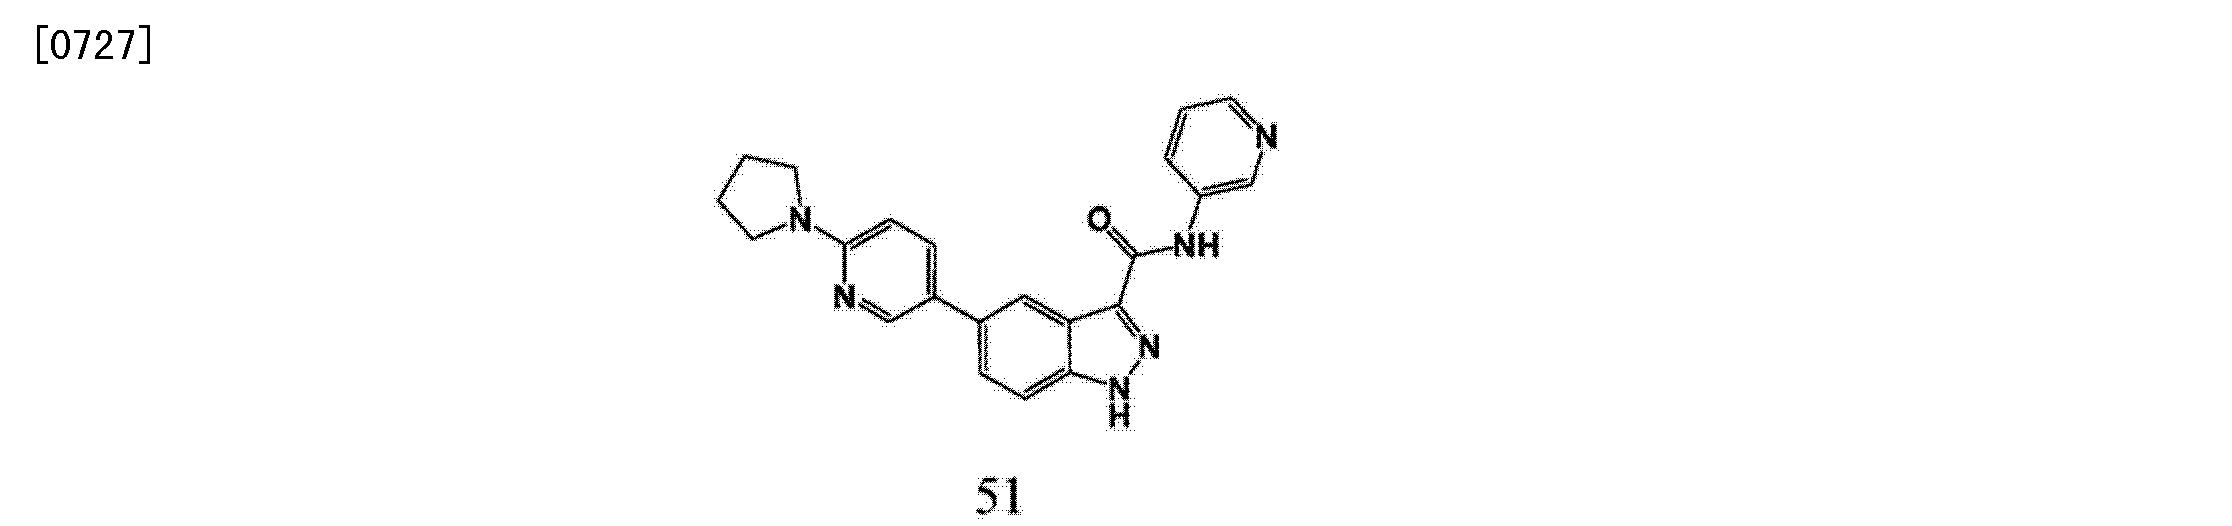 Figure CN103929963AD01843